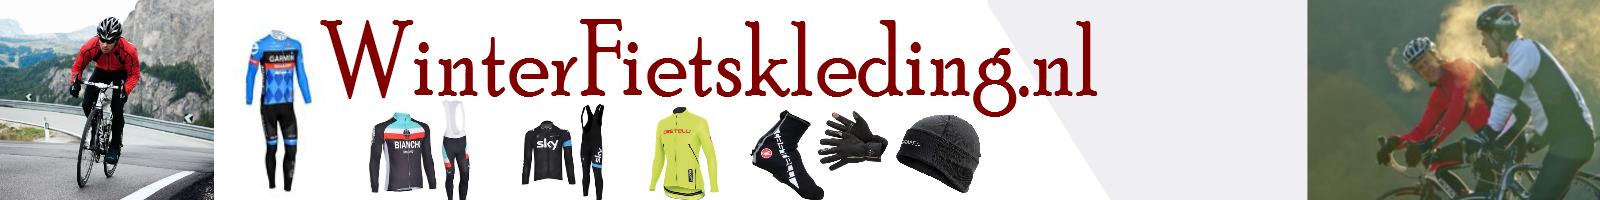 Winterfietskleding.nl